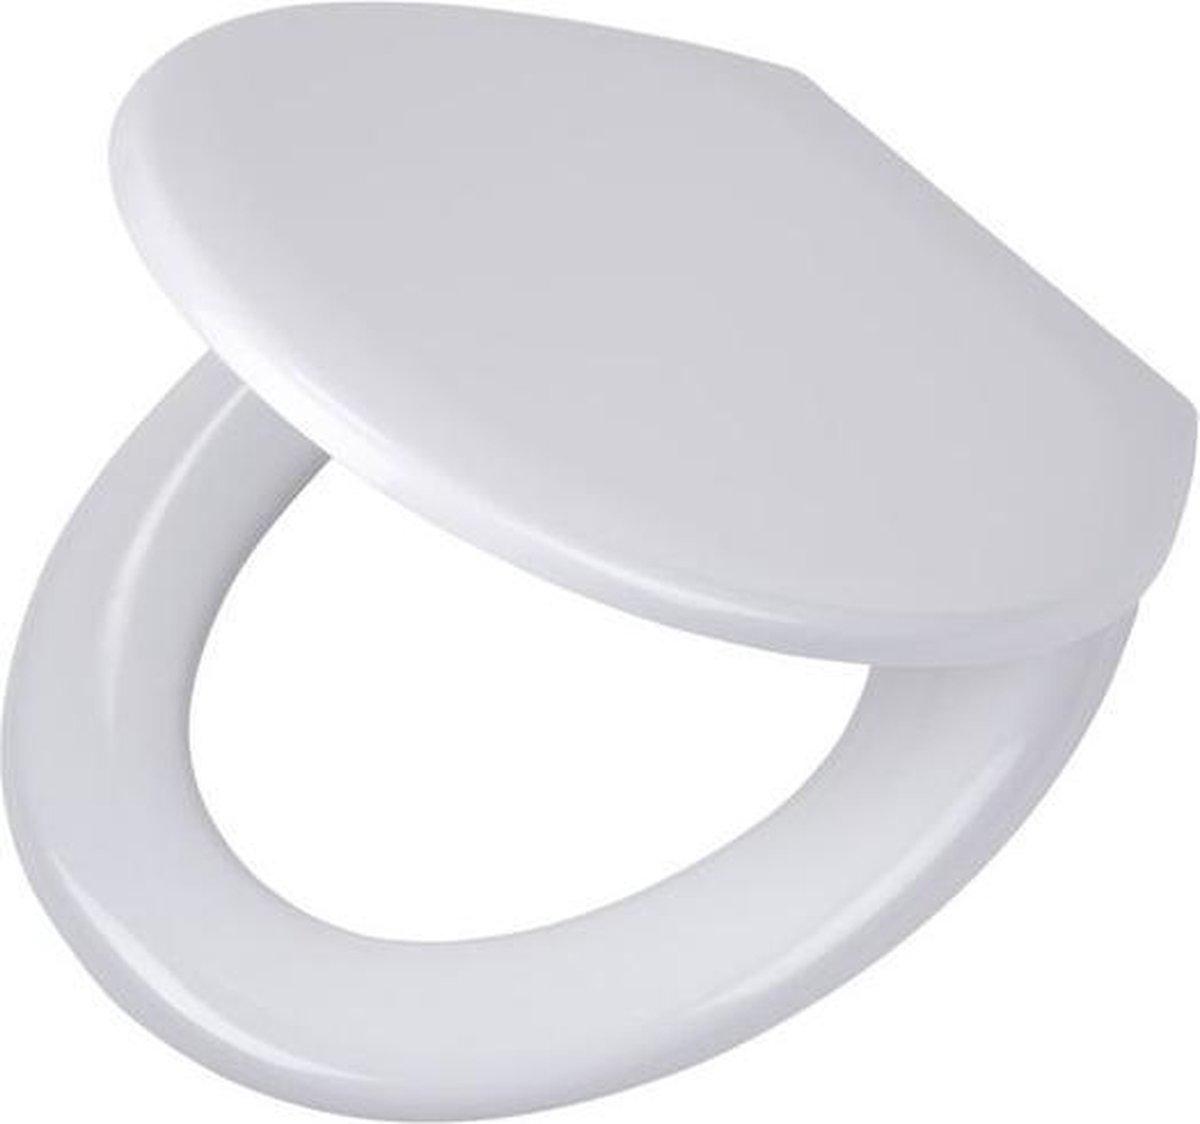 Tiger Pasadena wc-bril - Softclose - Thermoplast - Afklikbaar - Wit